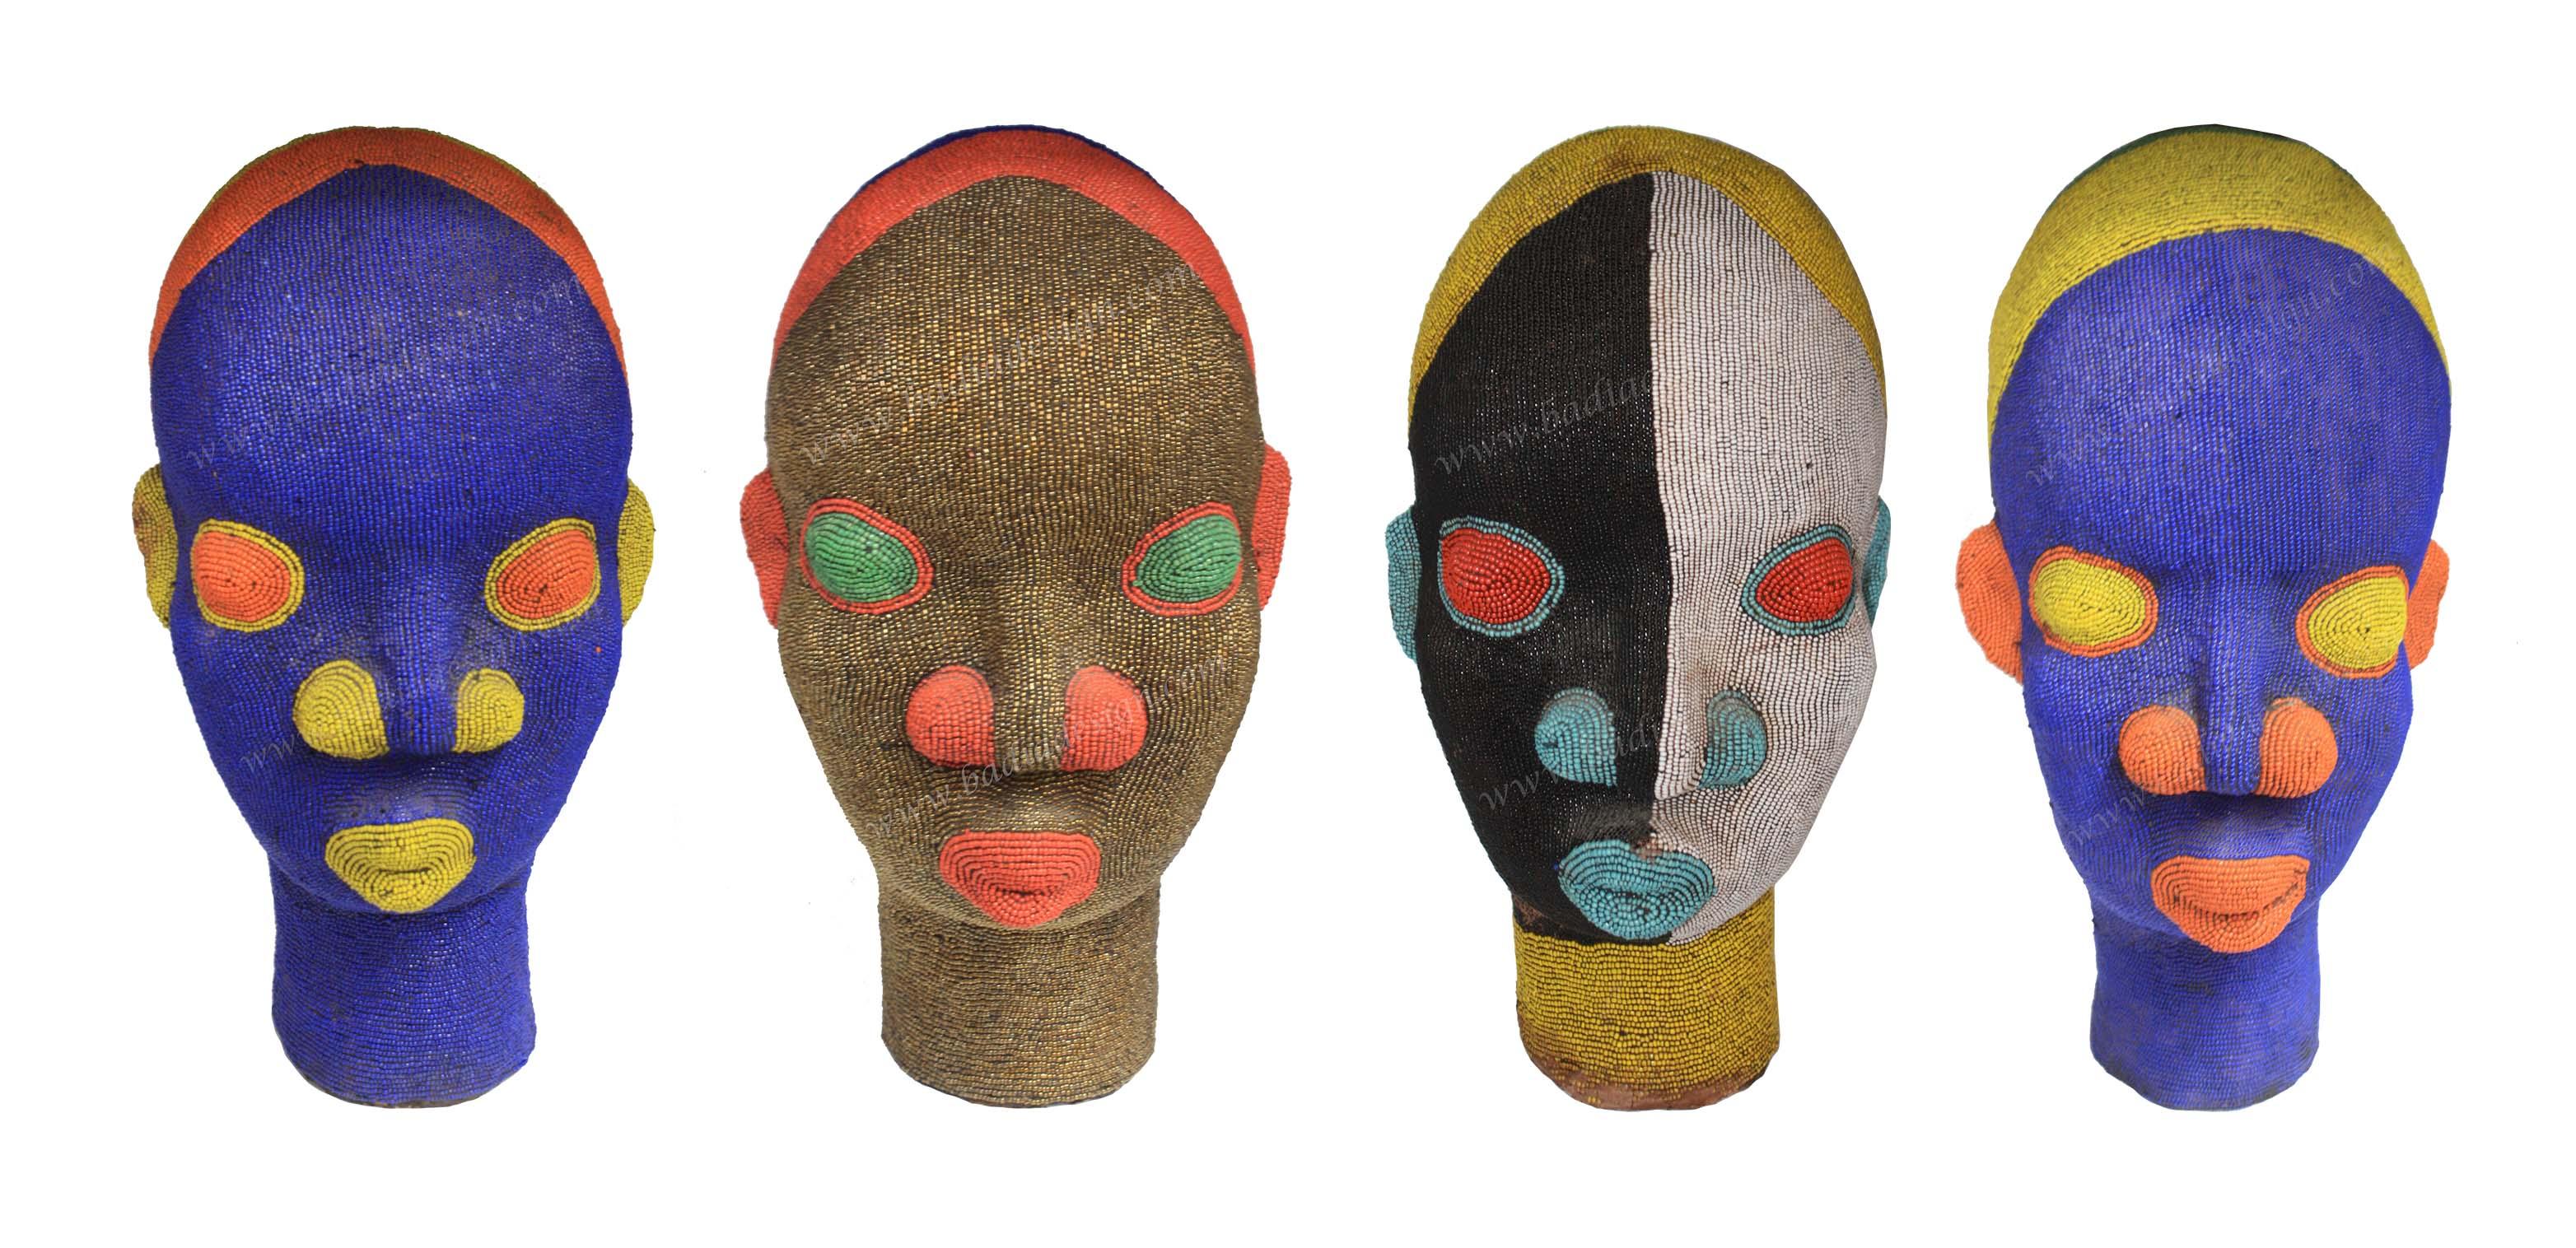 african-beaded-heads-new-york-hd181.jpg